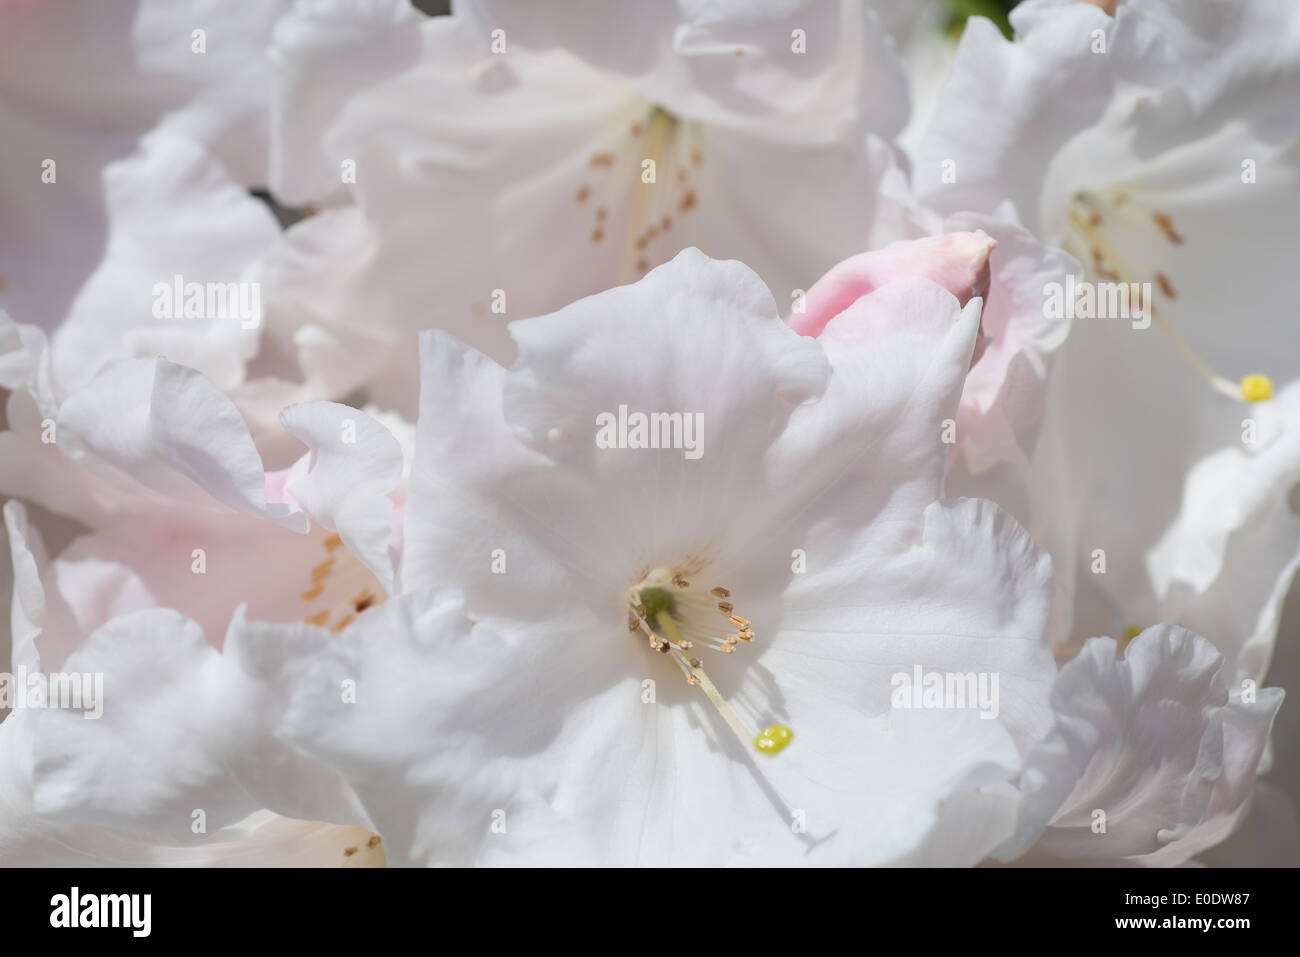 Rhododendron 'Loderi pink diamond' - Stock Image